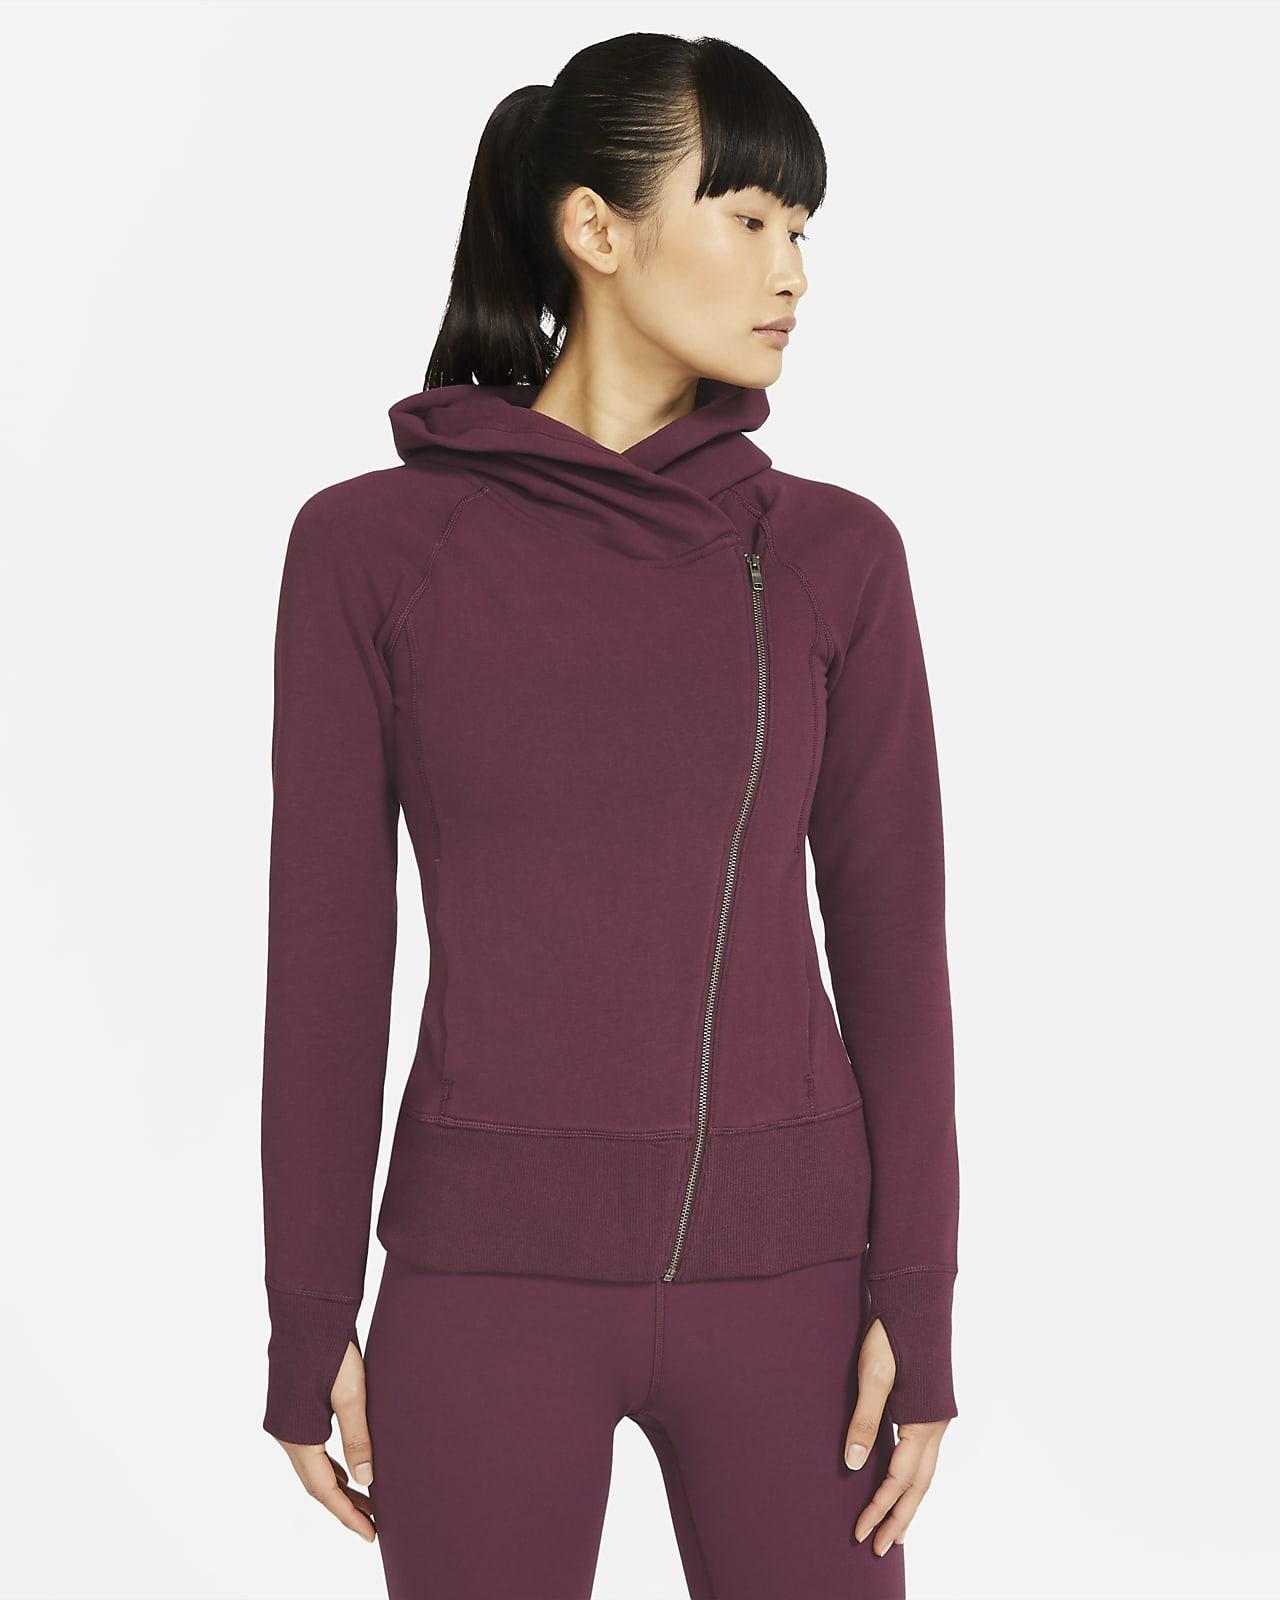 Nike Yoga 女款全長式拉鍊連帽上衣